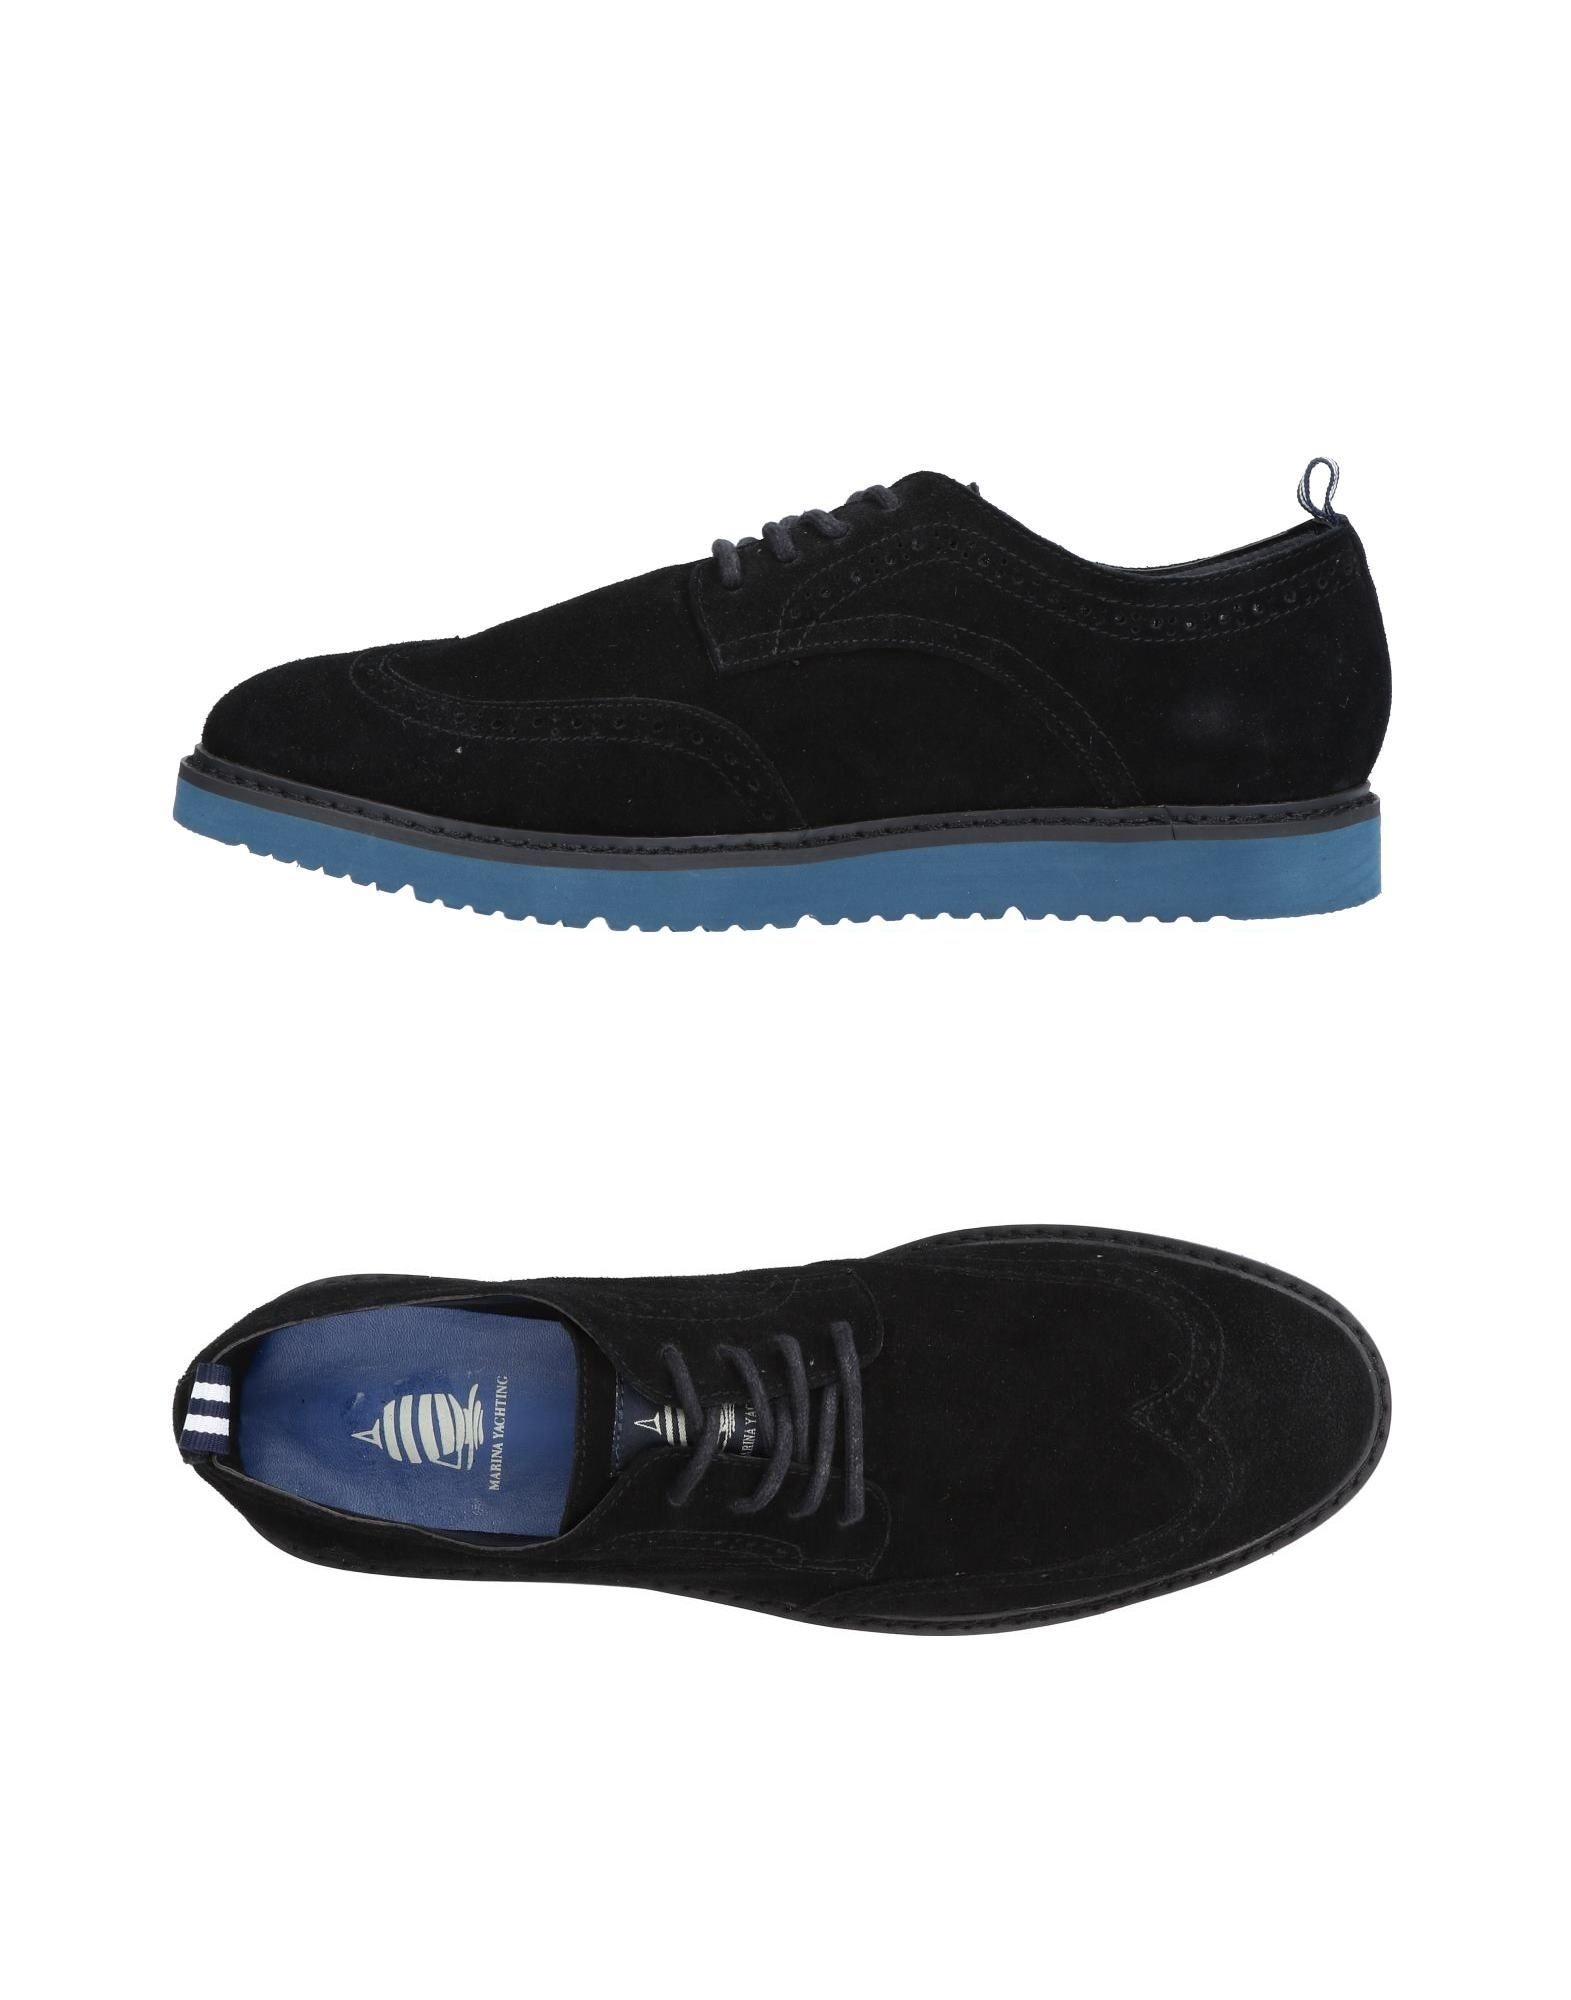 Rabatt echte Schuhe Marina Yachting Schnürschuhe Herren 11491571MU